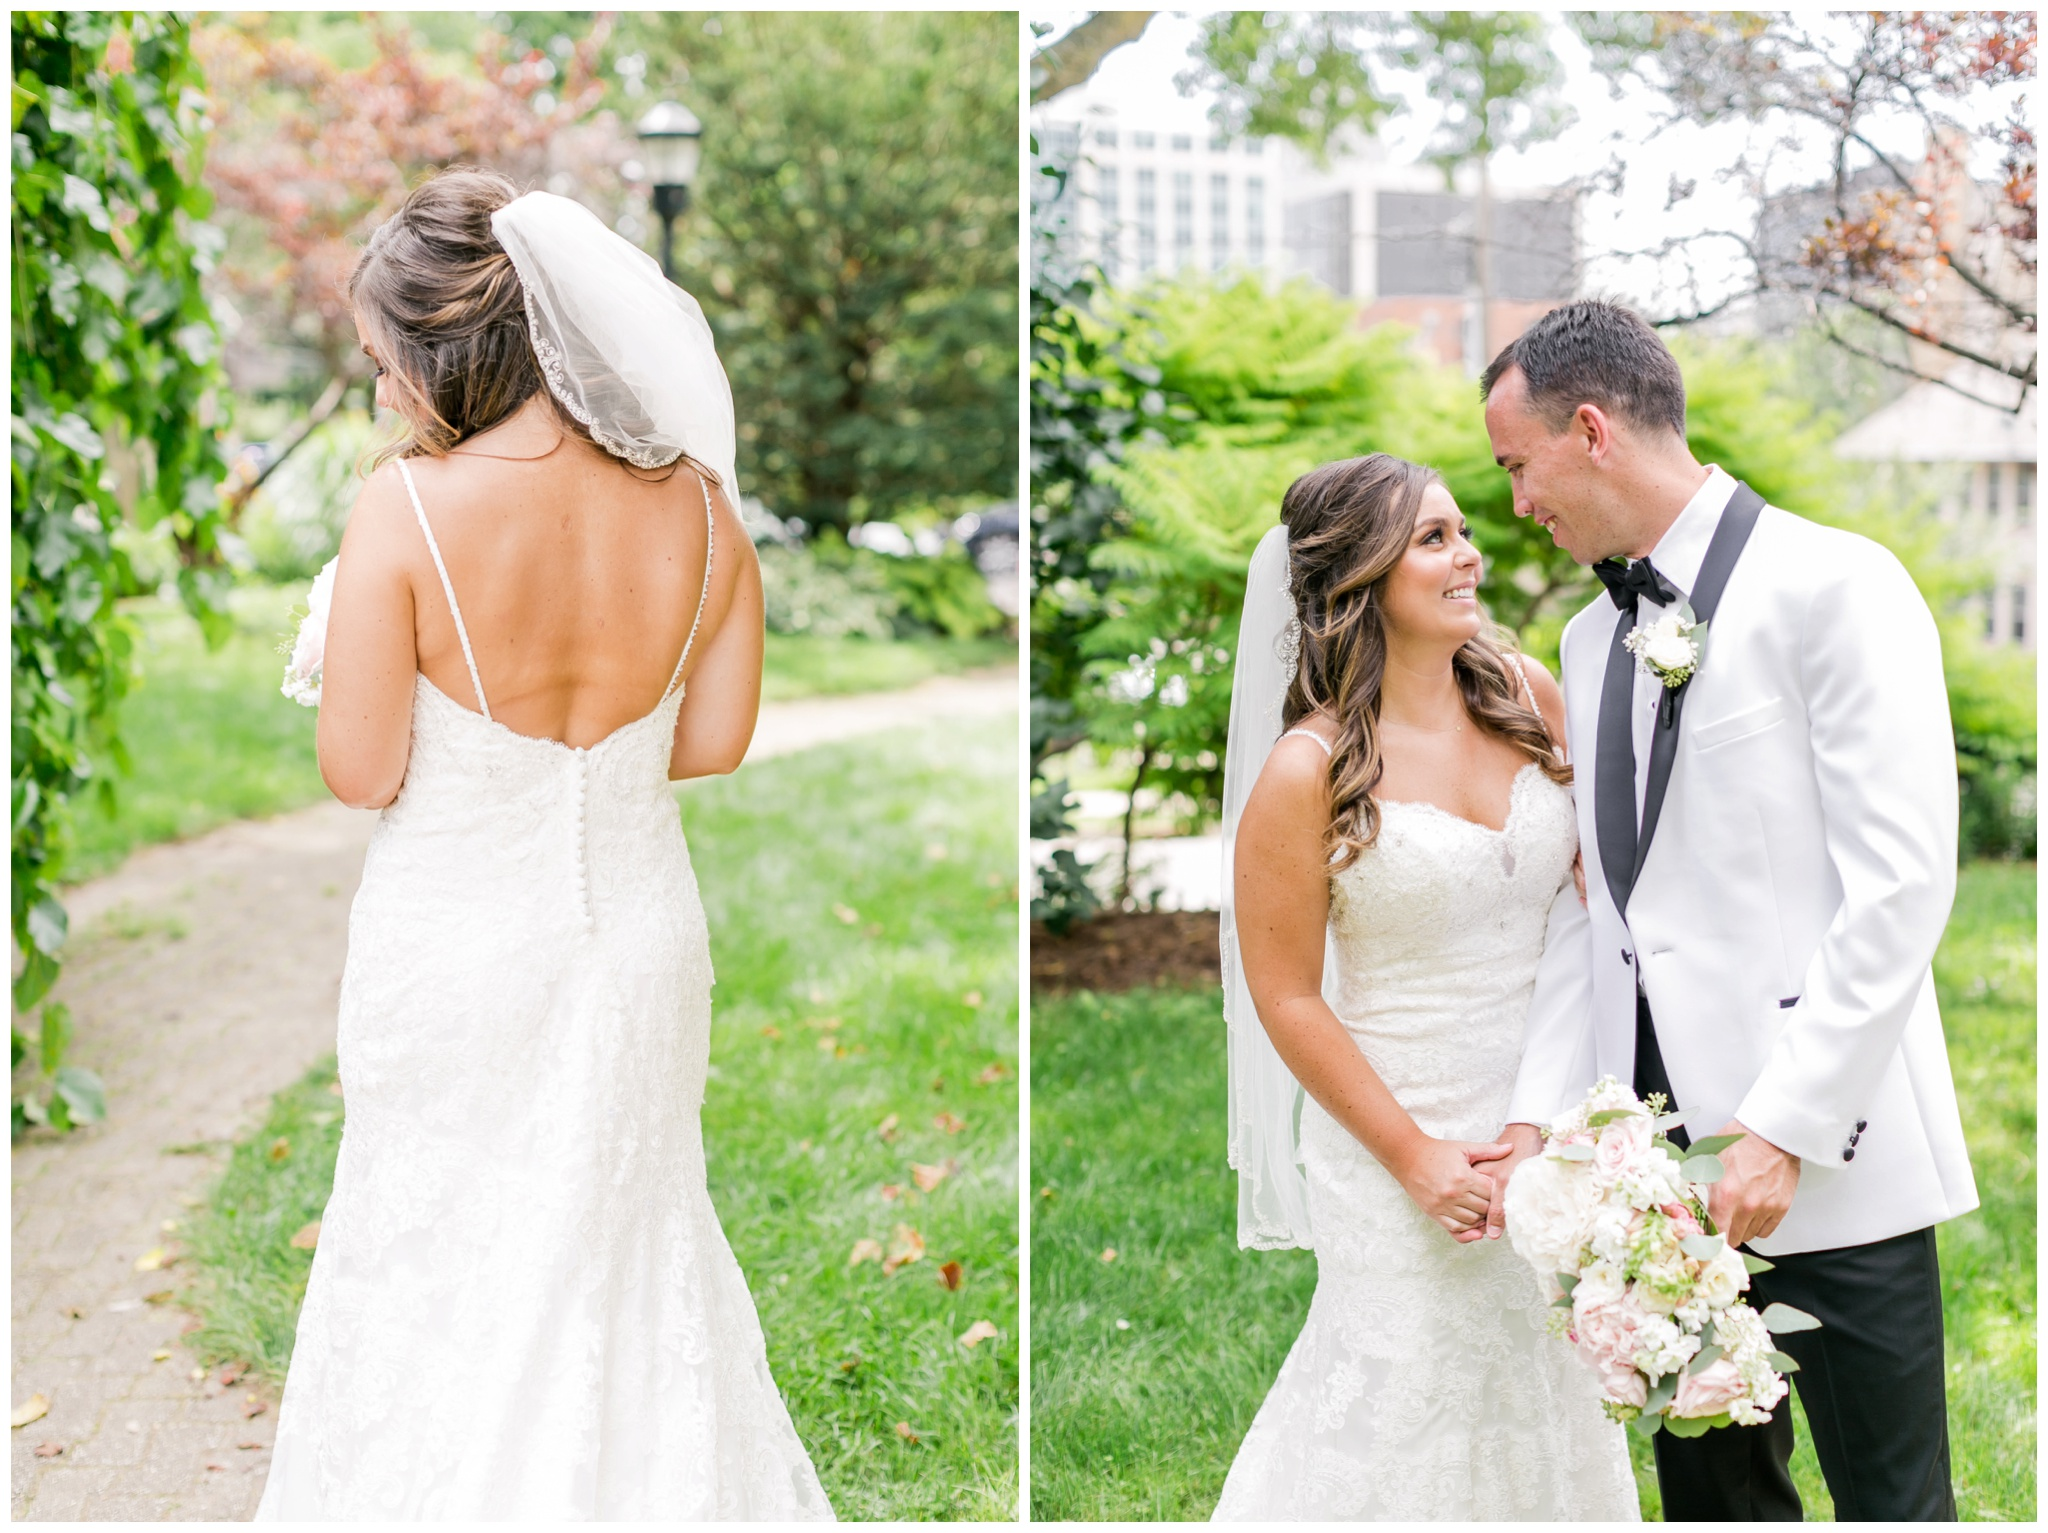 UW_Memorial_Union_wedding_madison_wisconsin_wedding_photographers_4605.jpg